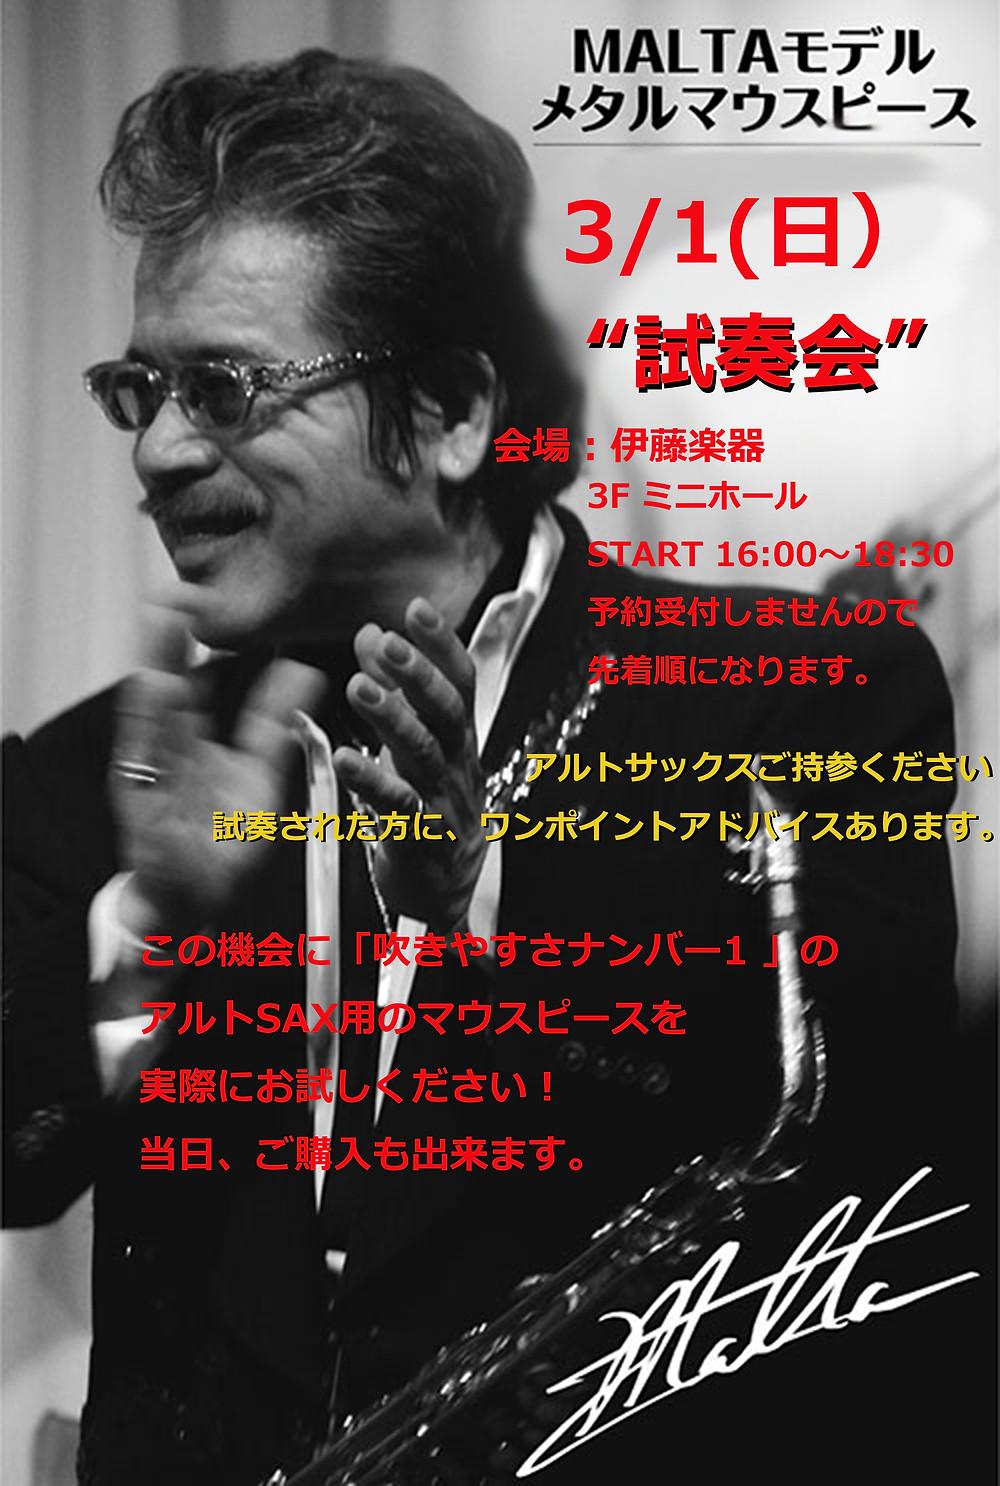 3月1日盛岡市マッピ試奏会用MALTA.jpg